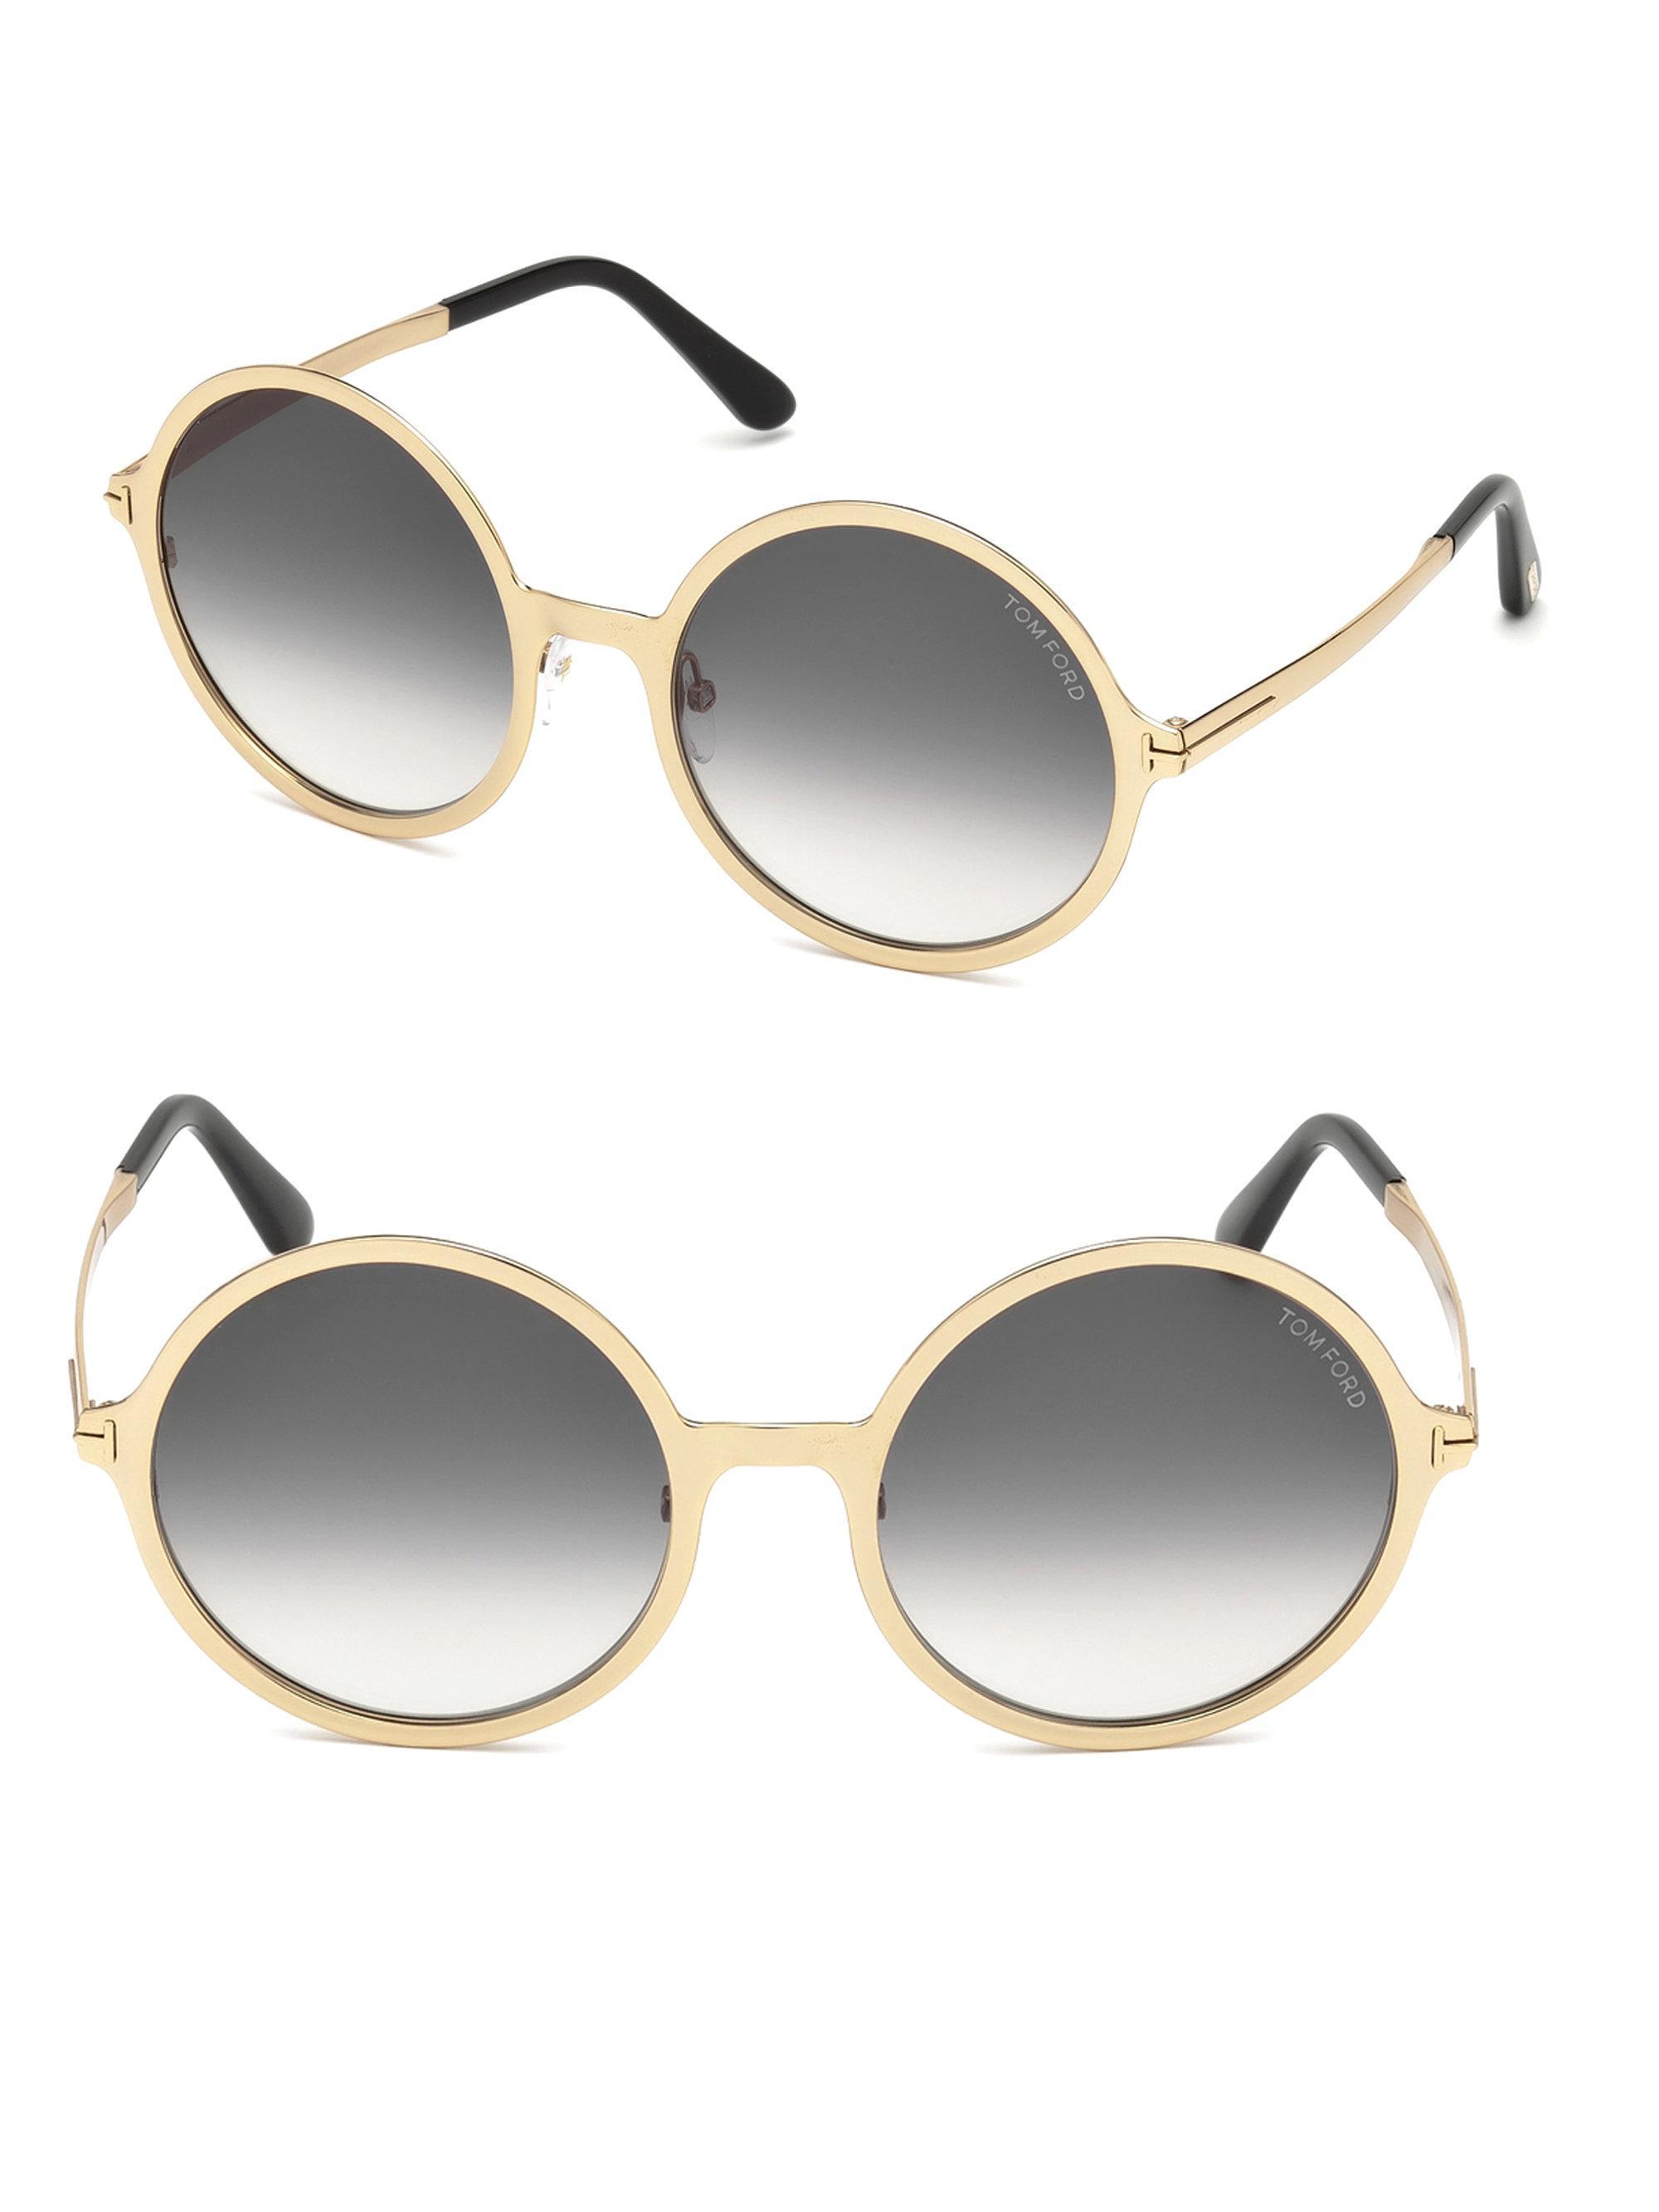 009302e1f4d Tom Ford Ava Round Sunglasses - Lyst